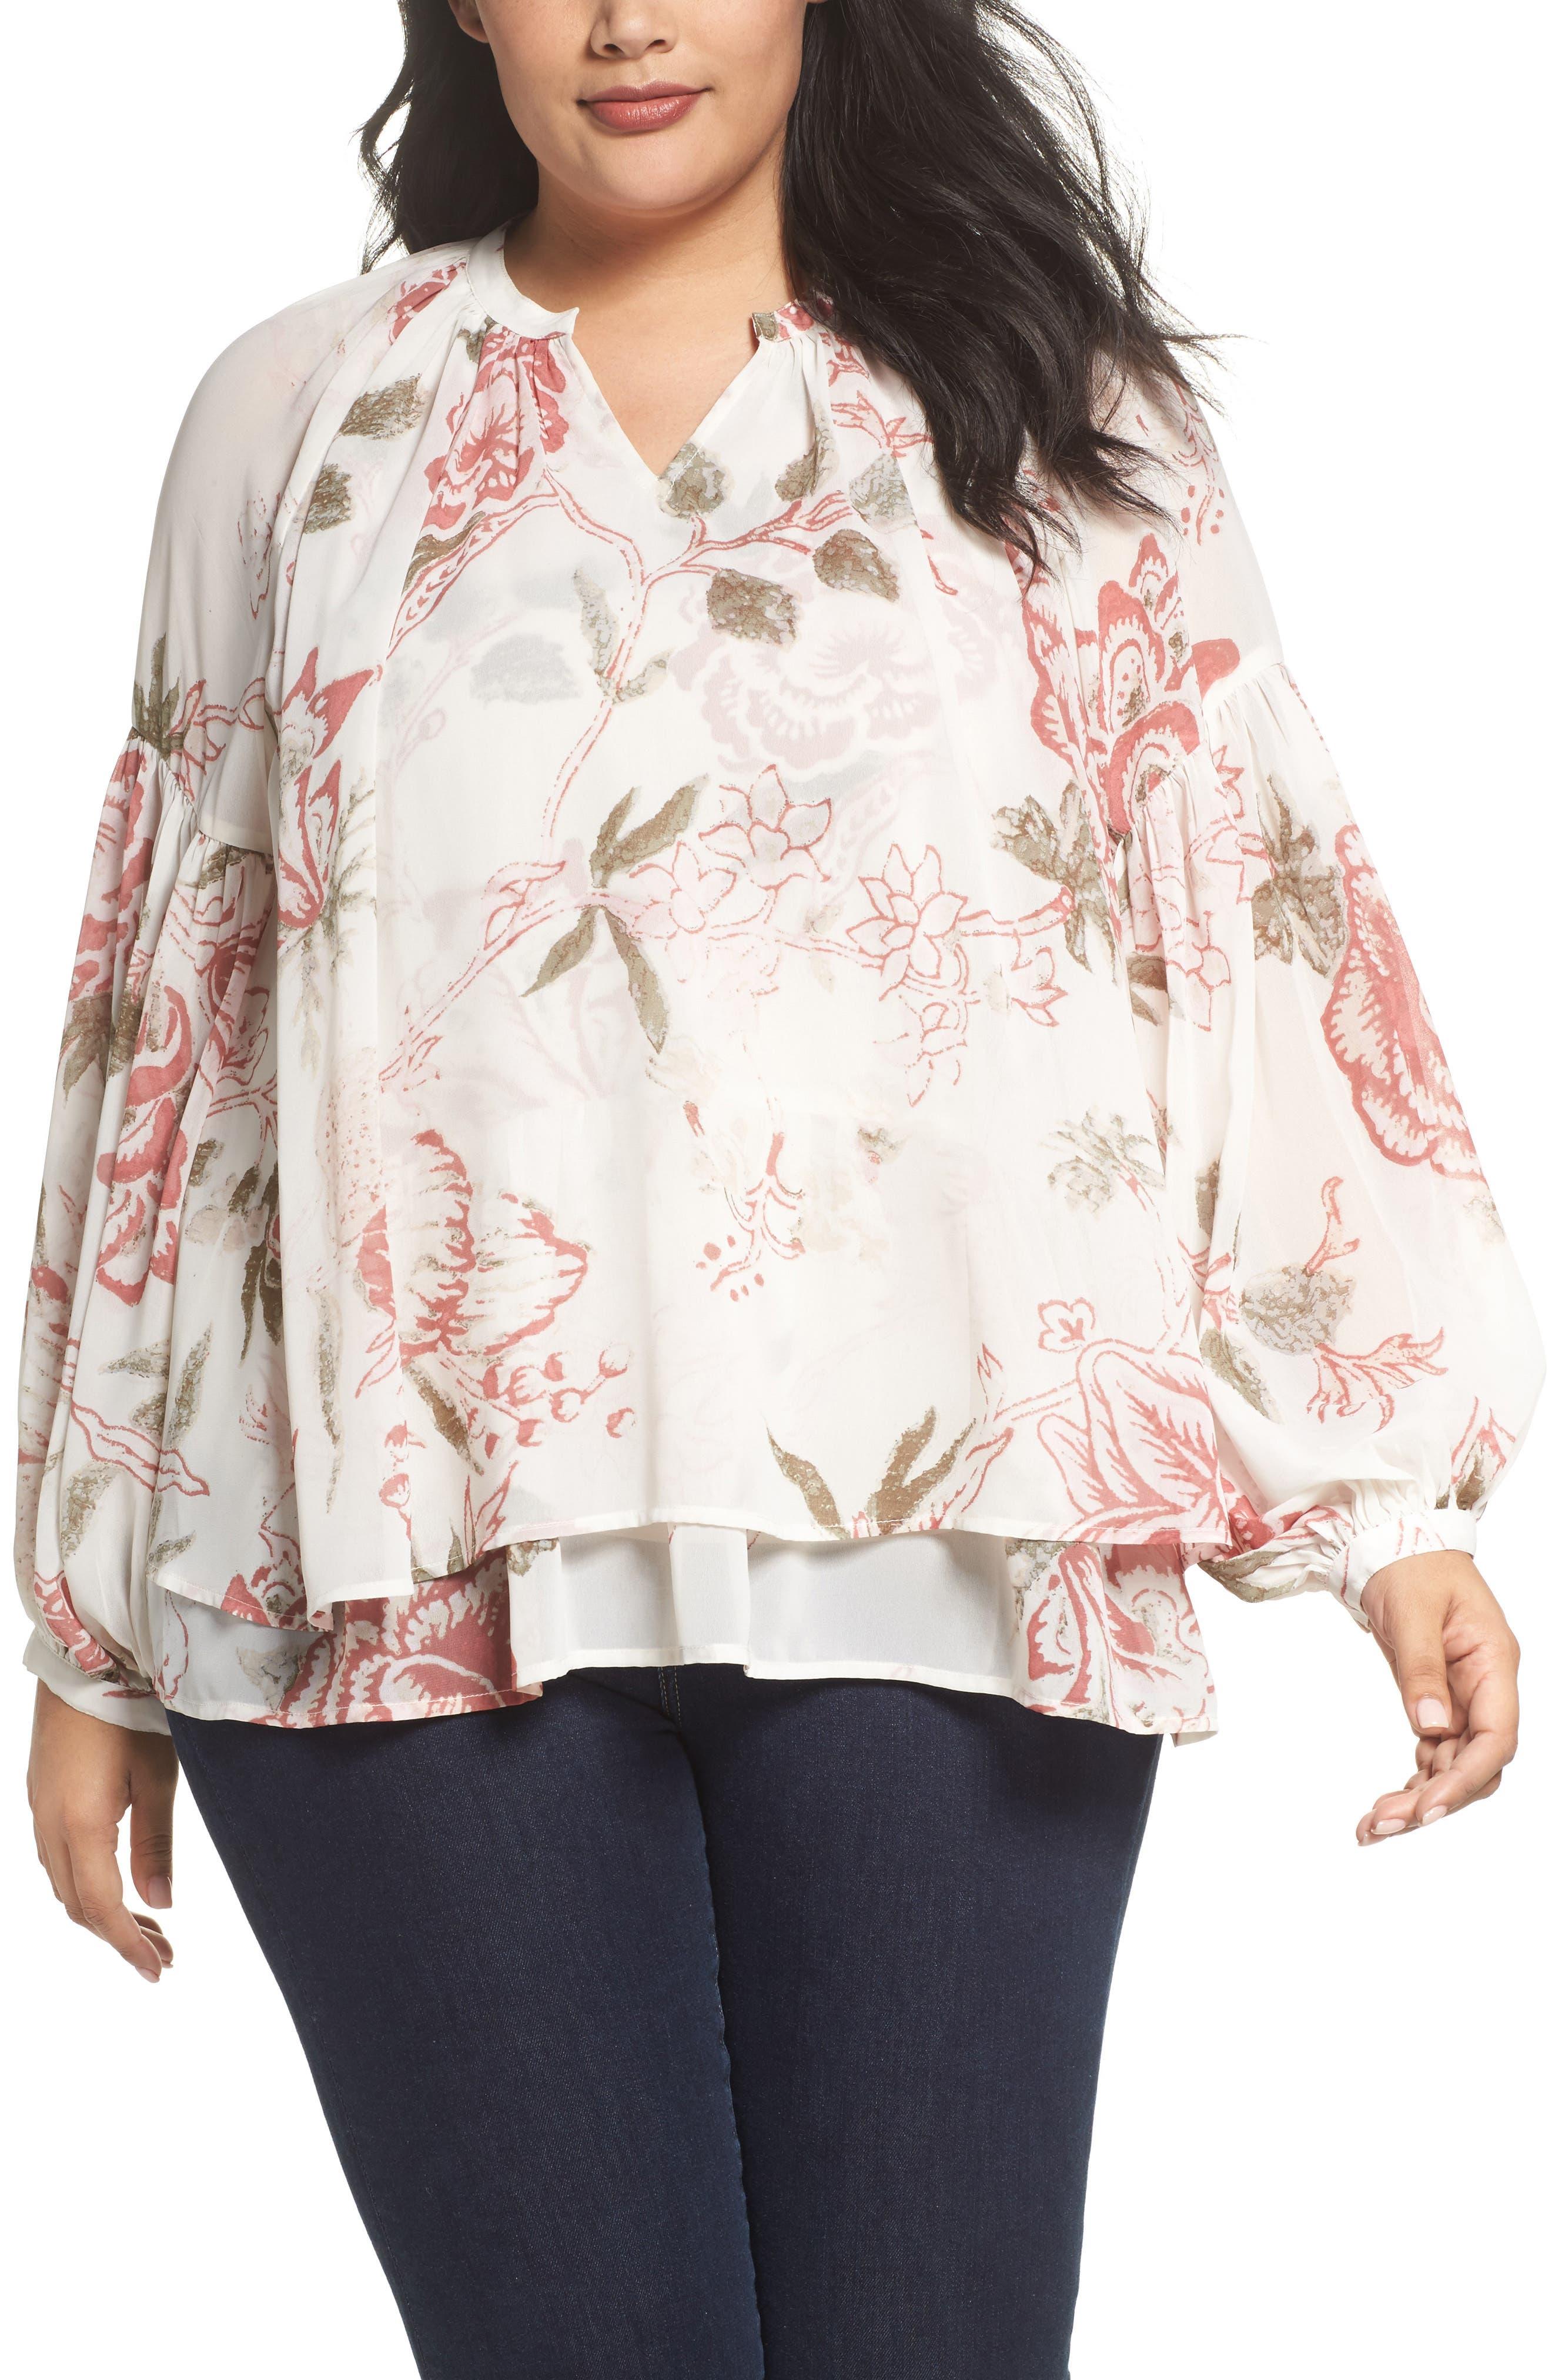 Main Image - Lucky Brand Jenna Print Peasant Top (Plus Size)